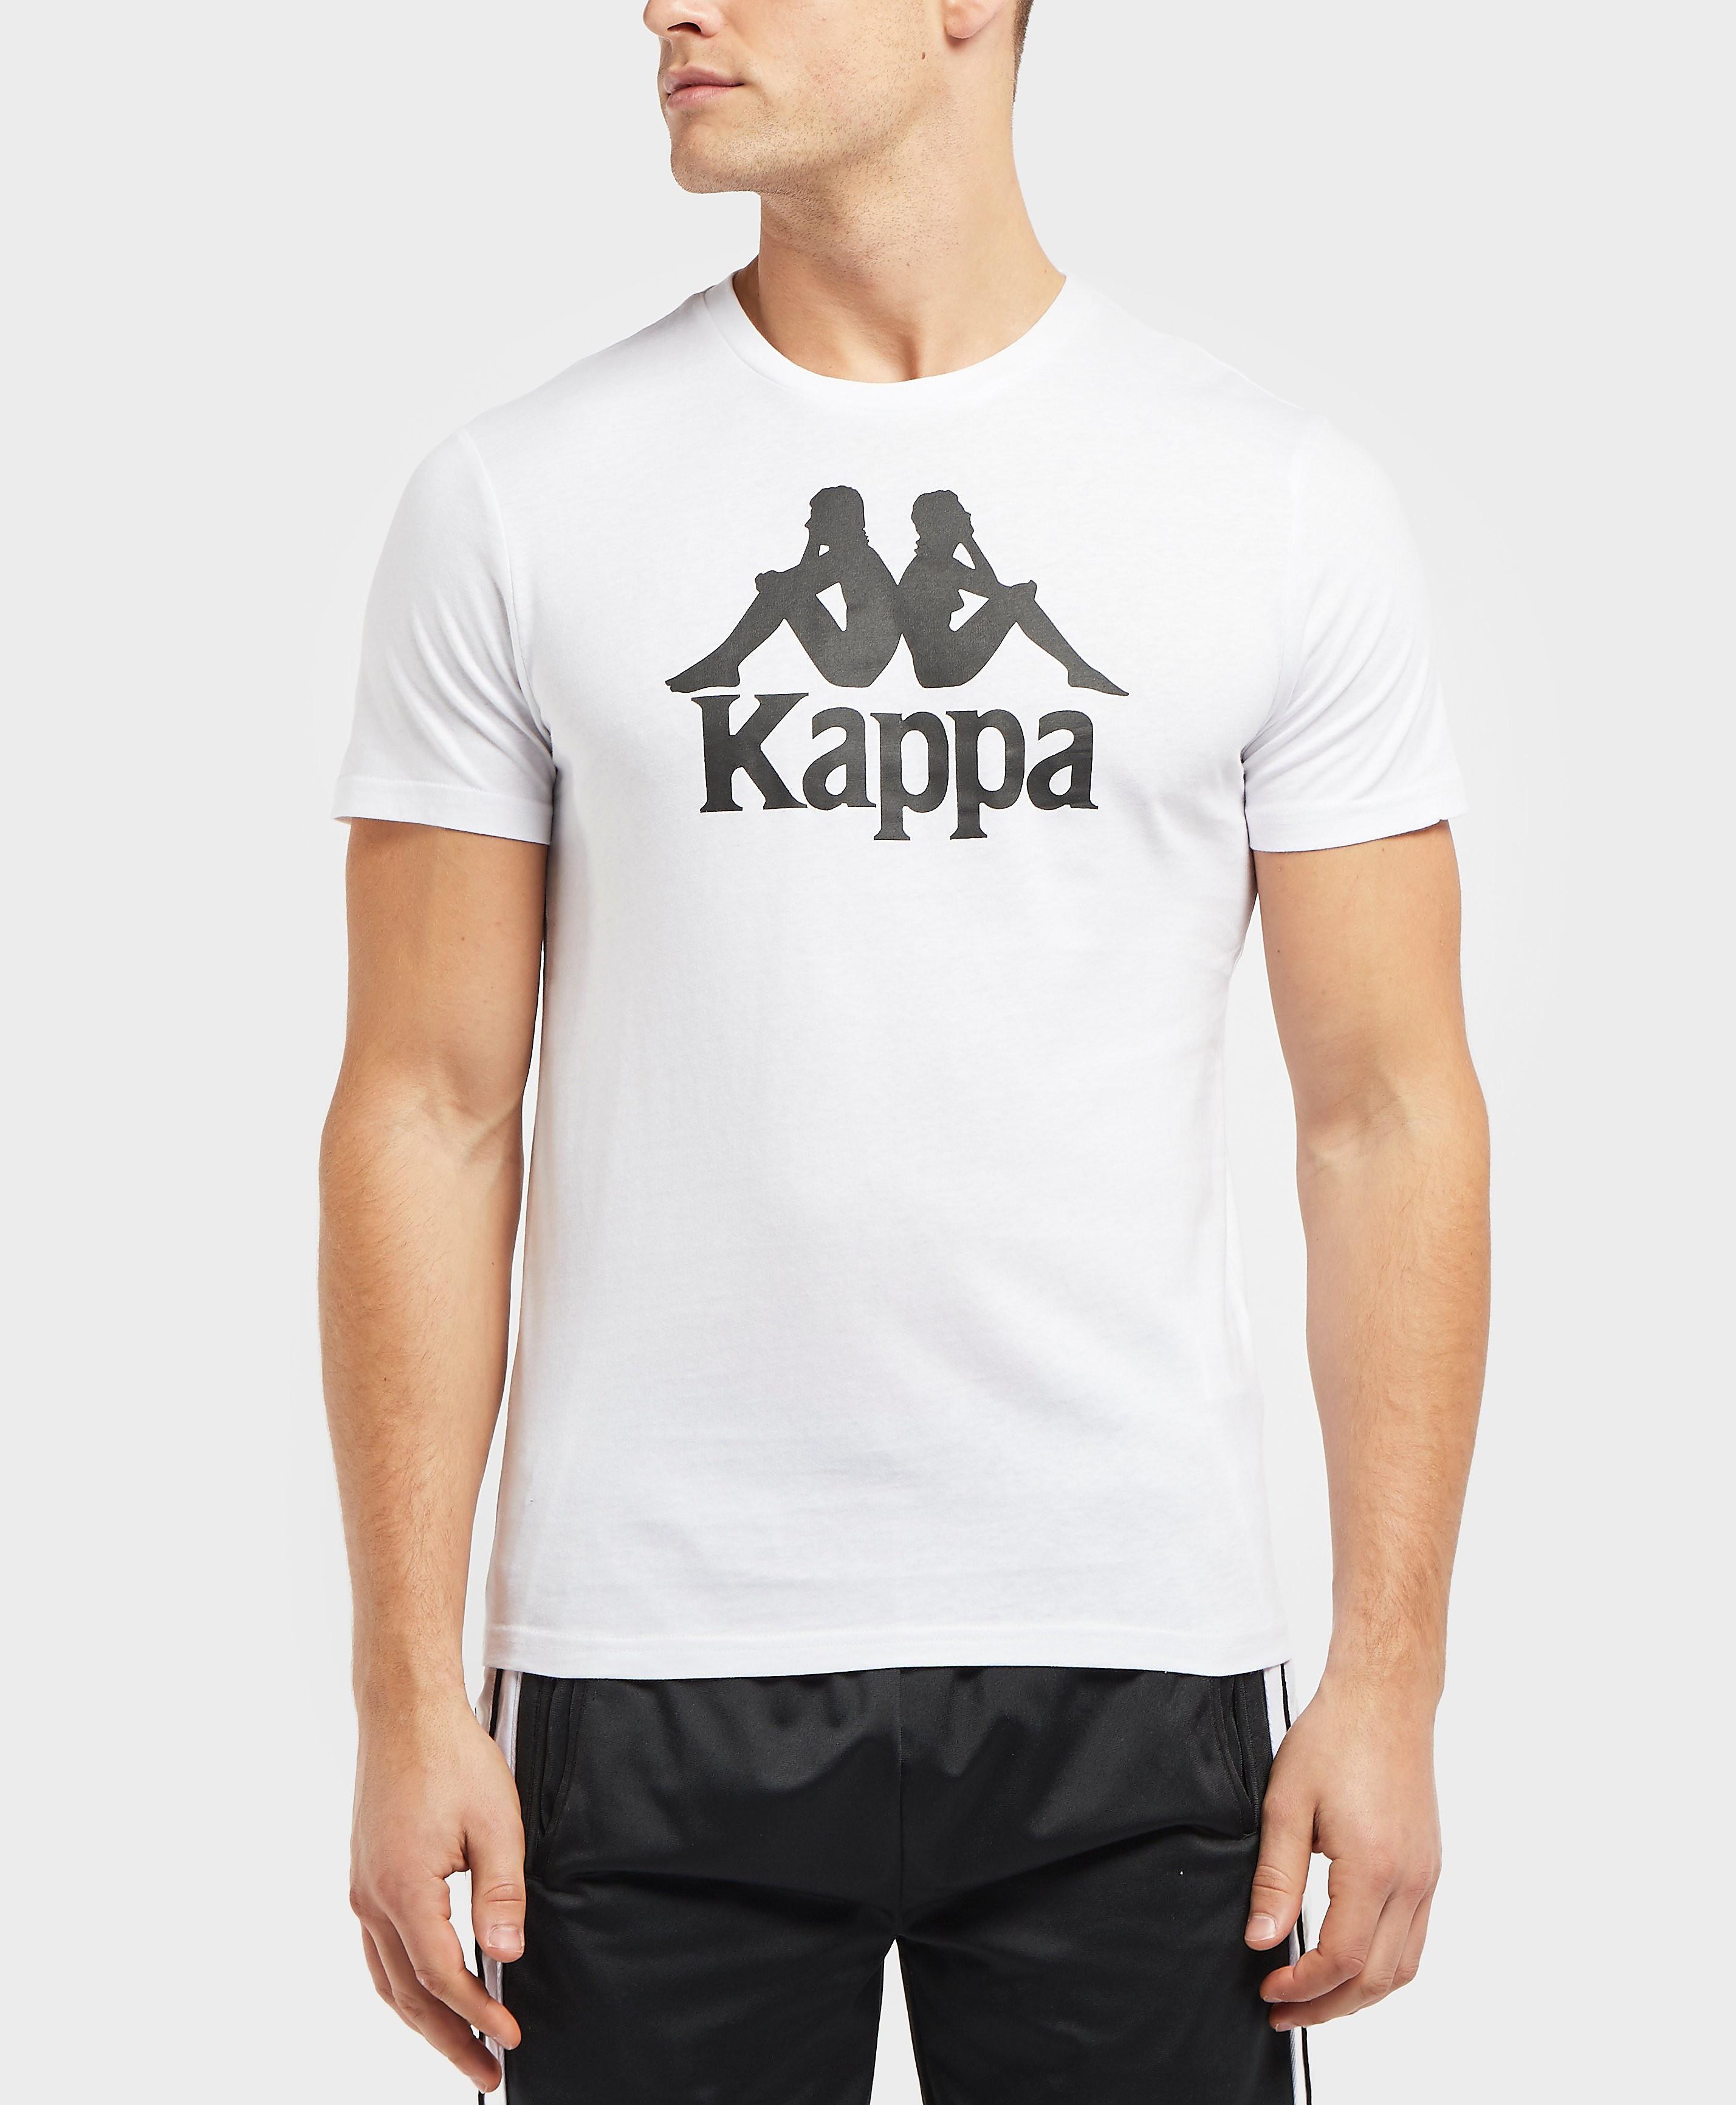 Kappa Authentic Logo Short Sleeve T-Shirt